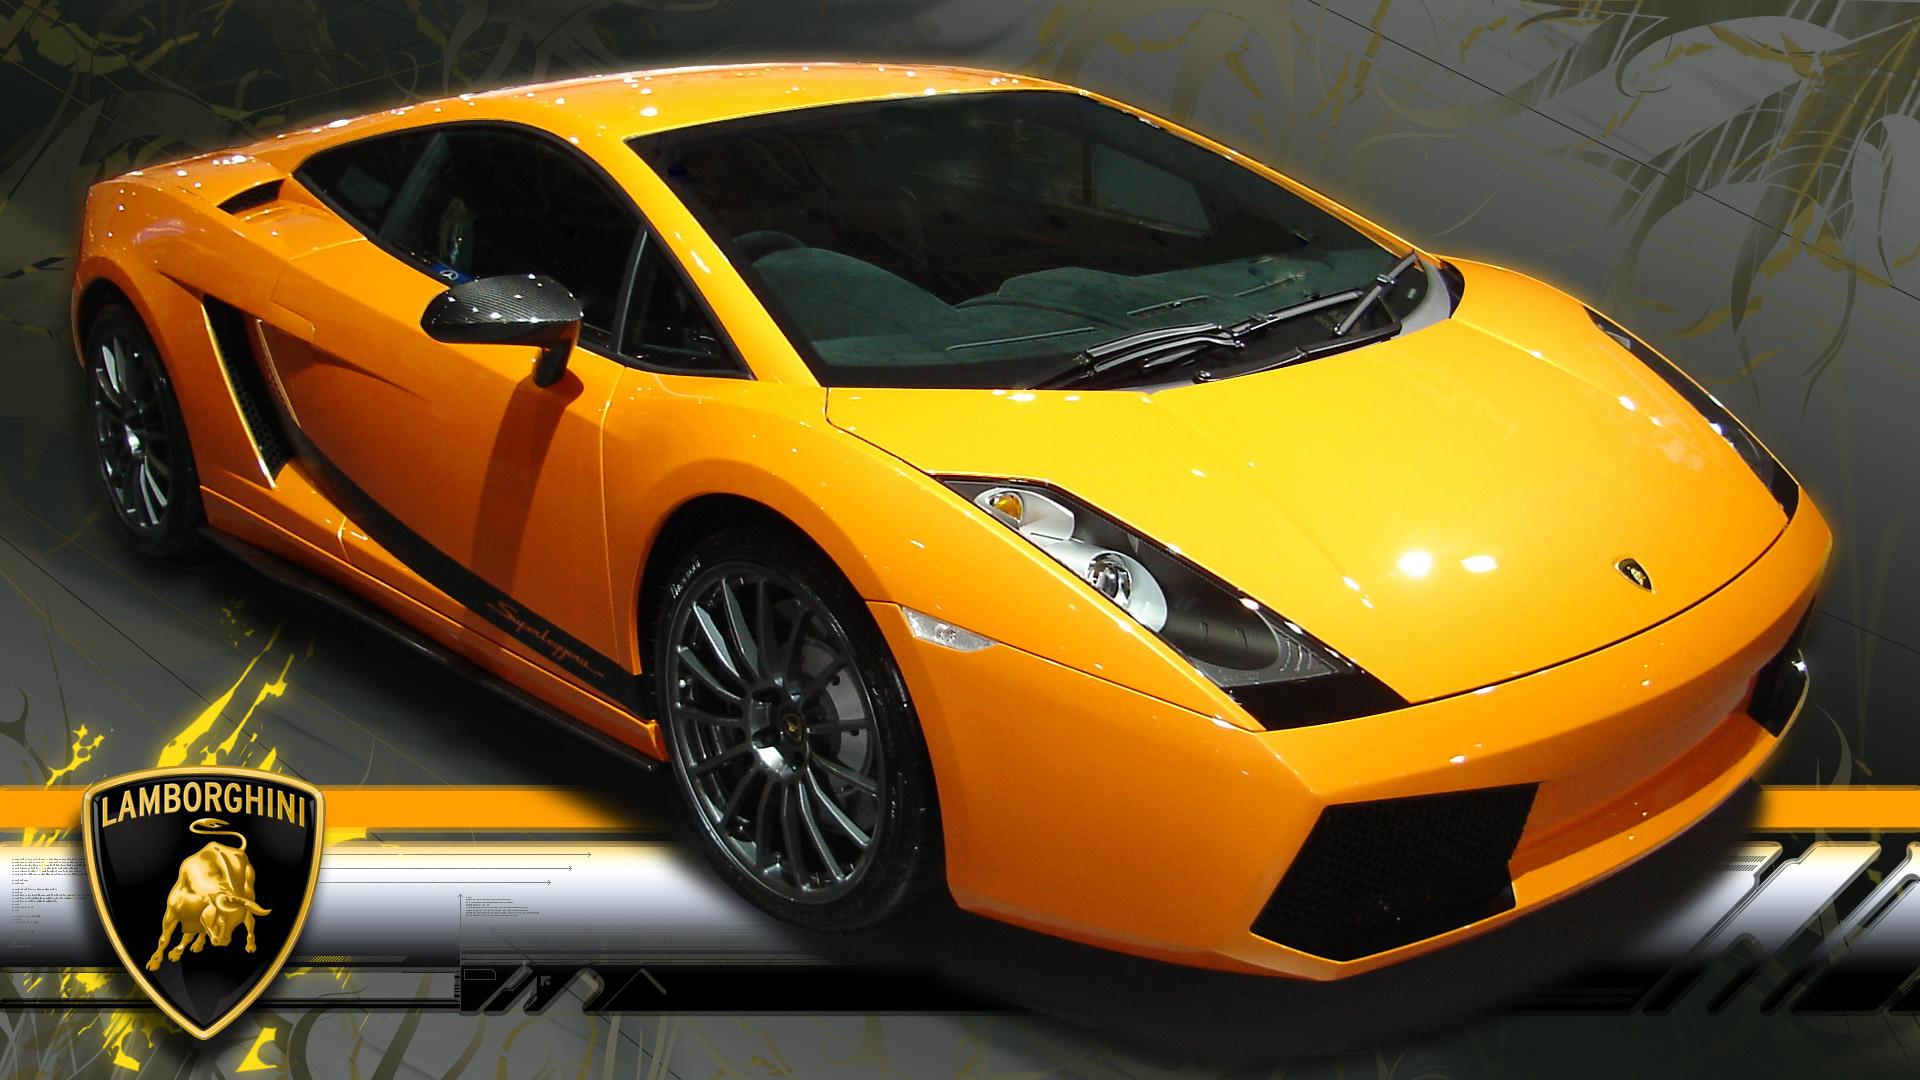 Yellow Tuned Lamborghini Wallpapers   HD Wallpapers